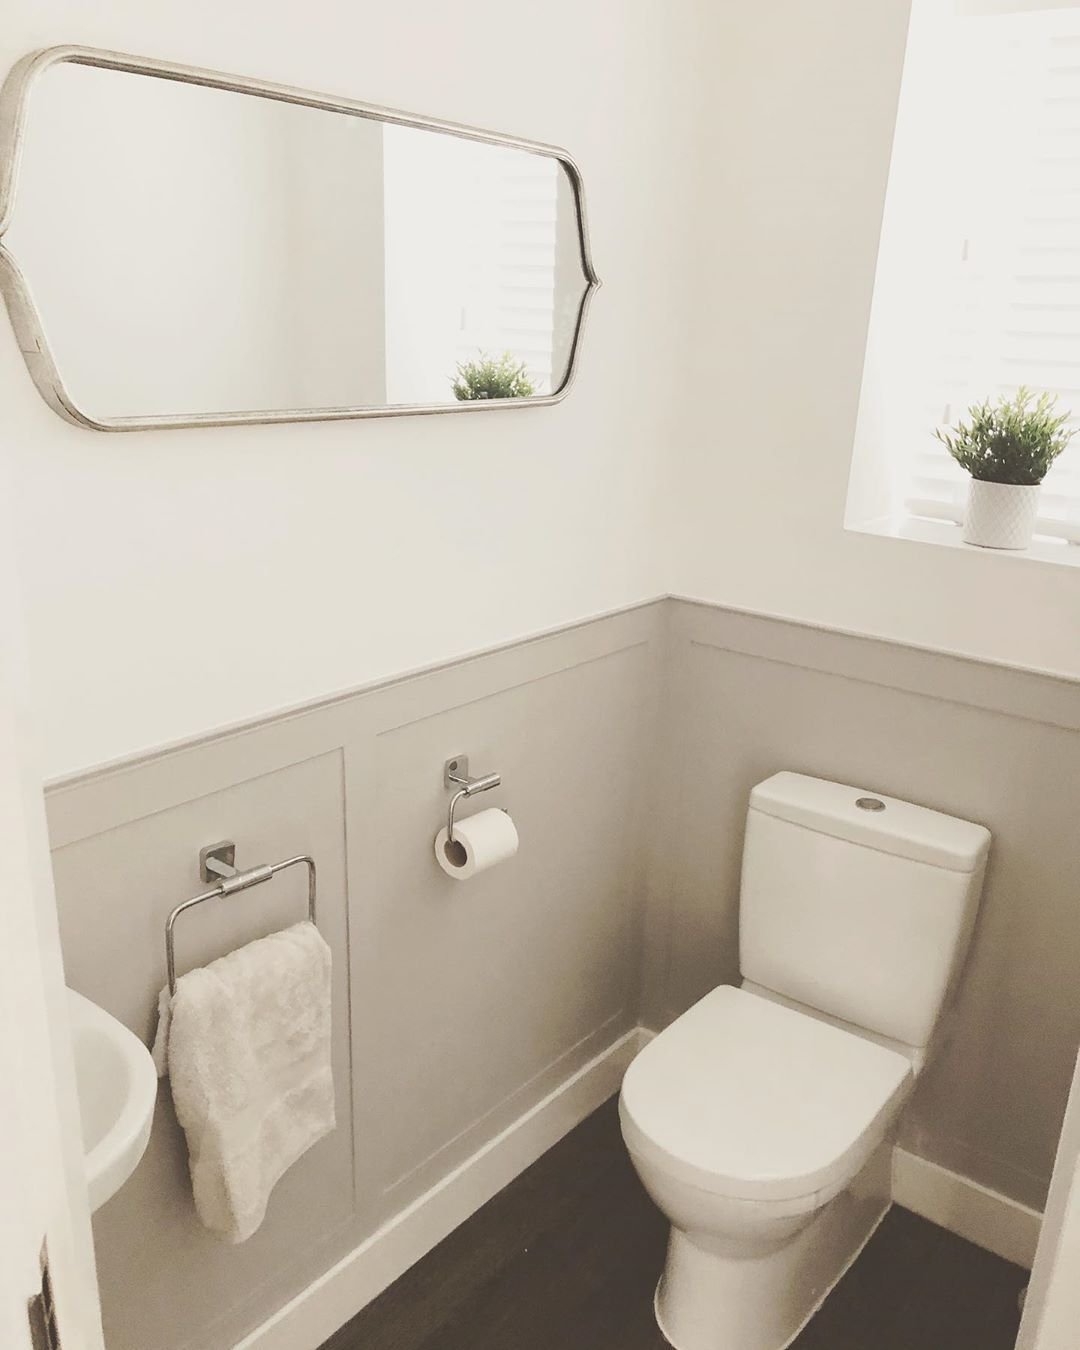 Downstairs Toilet Downstairs Toilet Small Toilet Room Small Downstairs Toilet